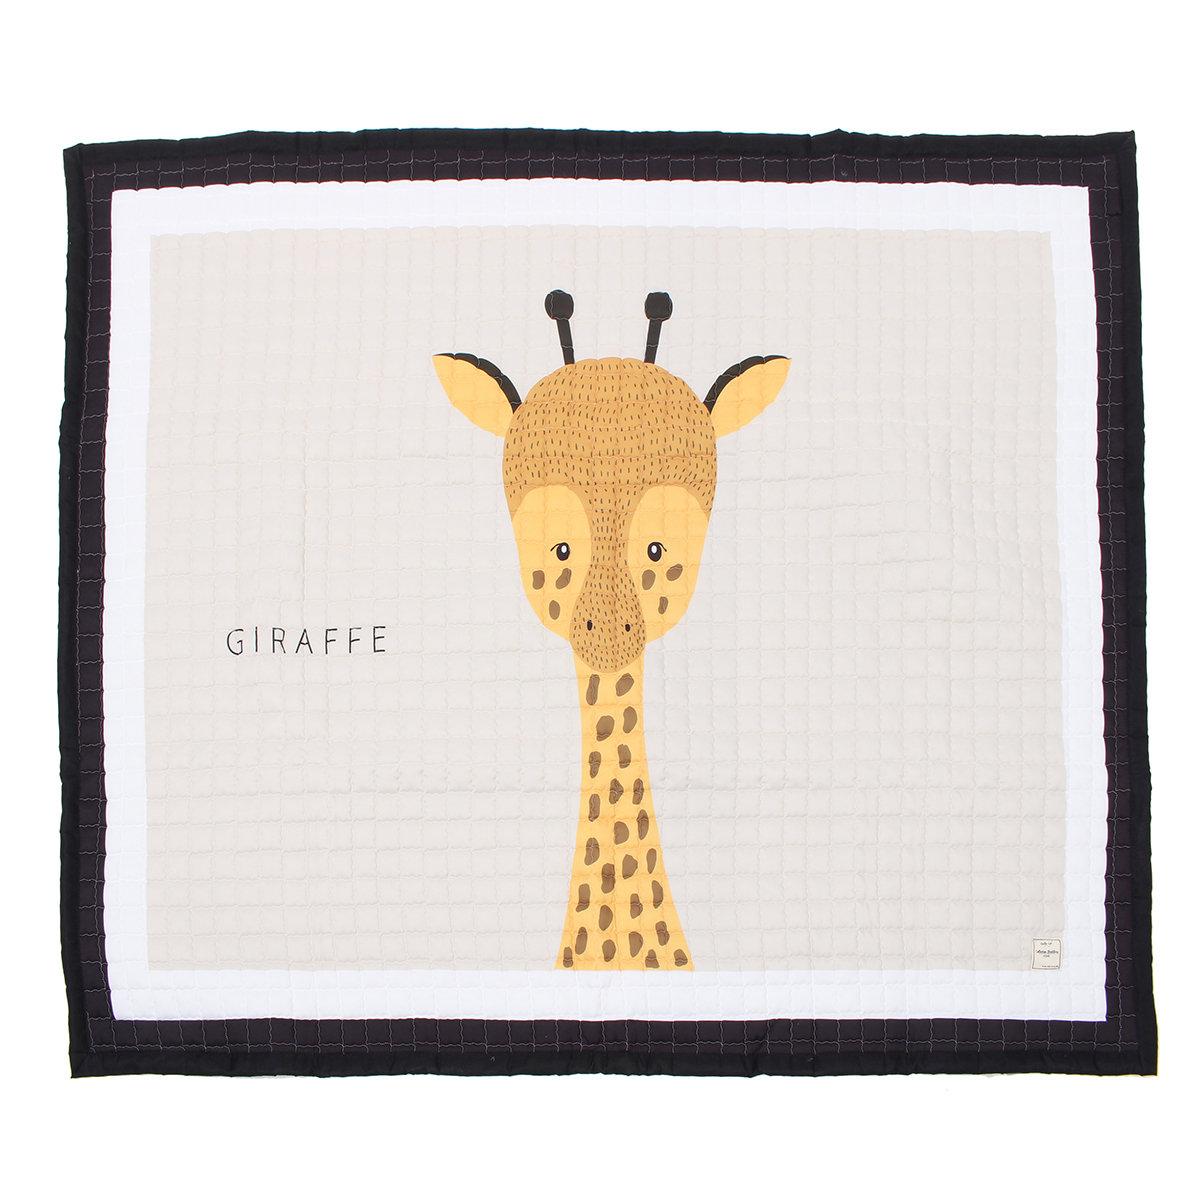 195x145CM Large Big Soft Rectangle Baby Kids Play Mat Floor Rug Crawling Blanket